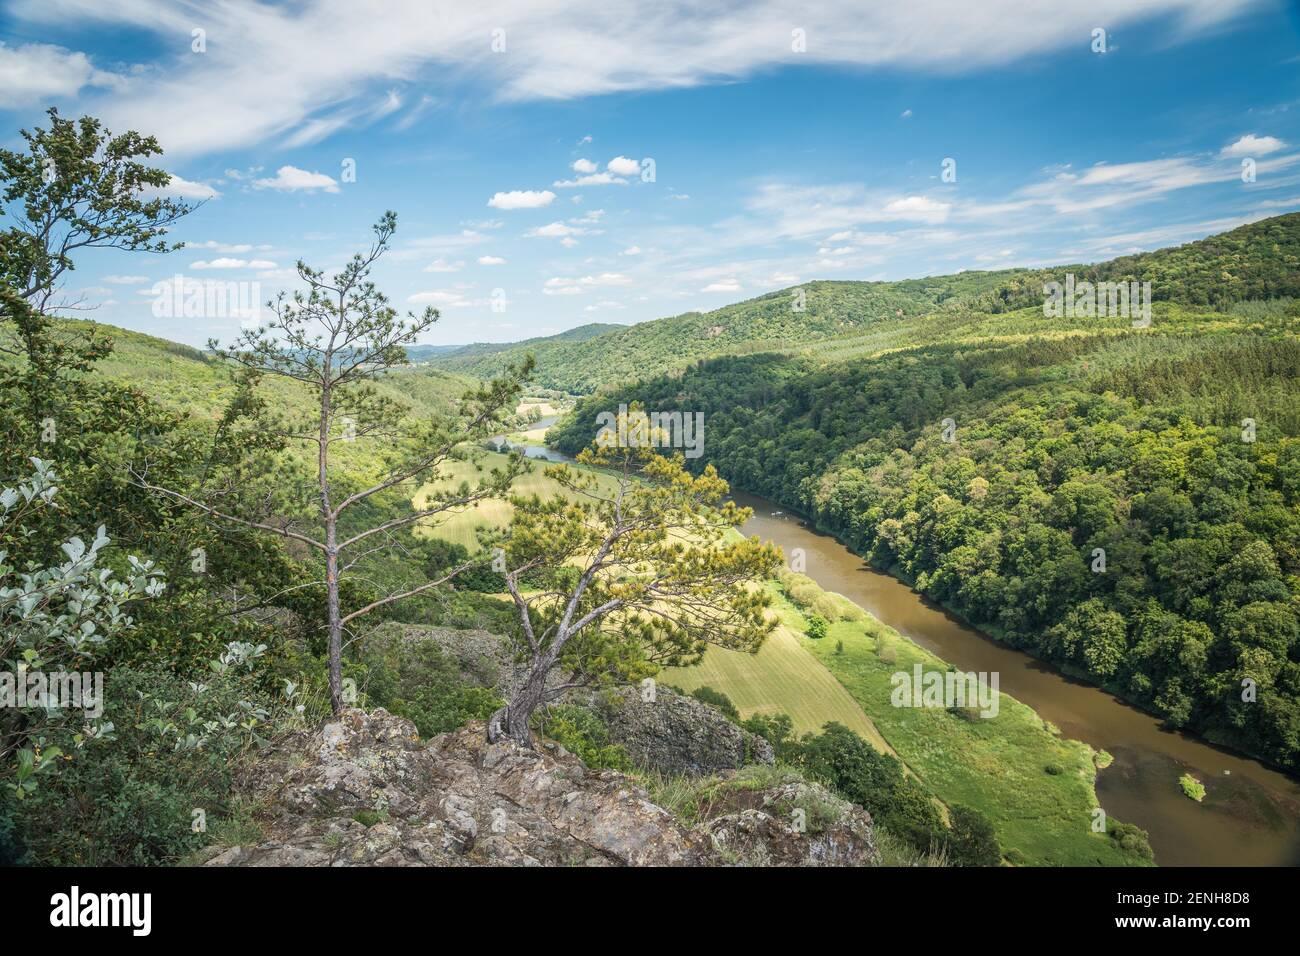 Canyon of river Berounka, view from a hill Certova skala in a Hracholusky village Czech Republic. Stock Photo